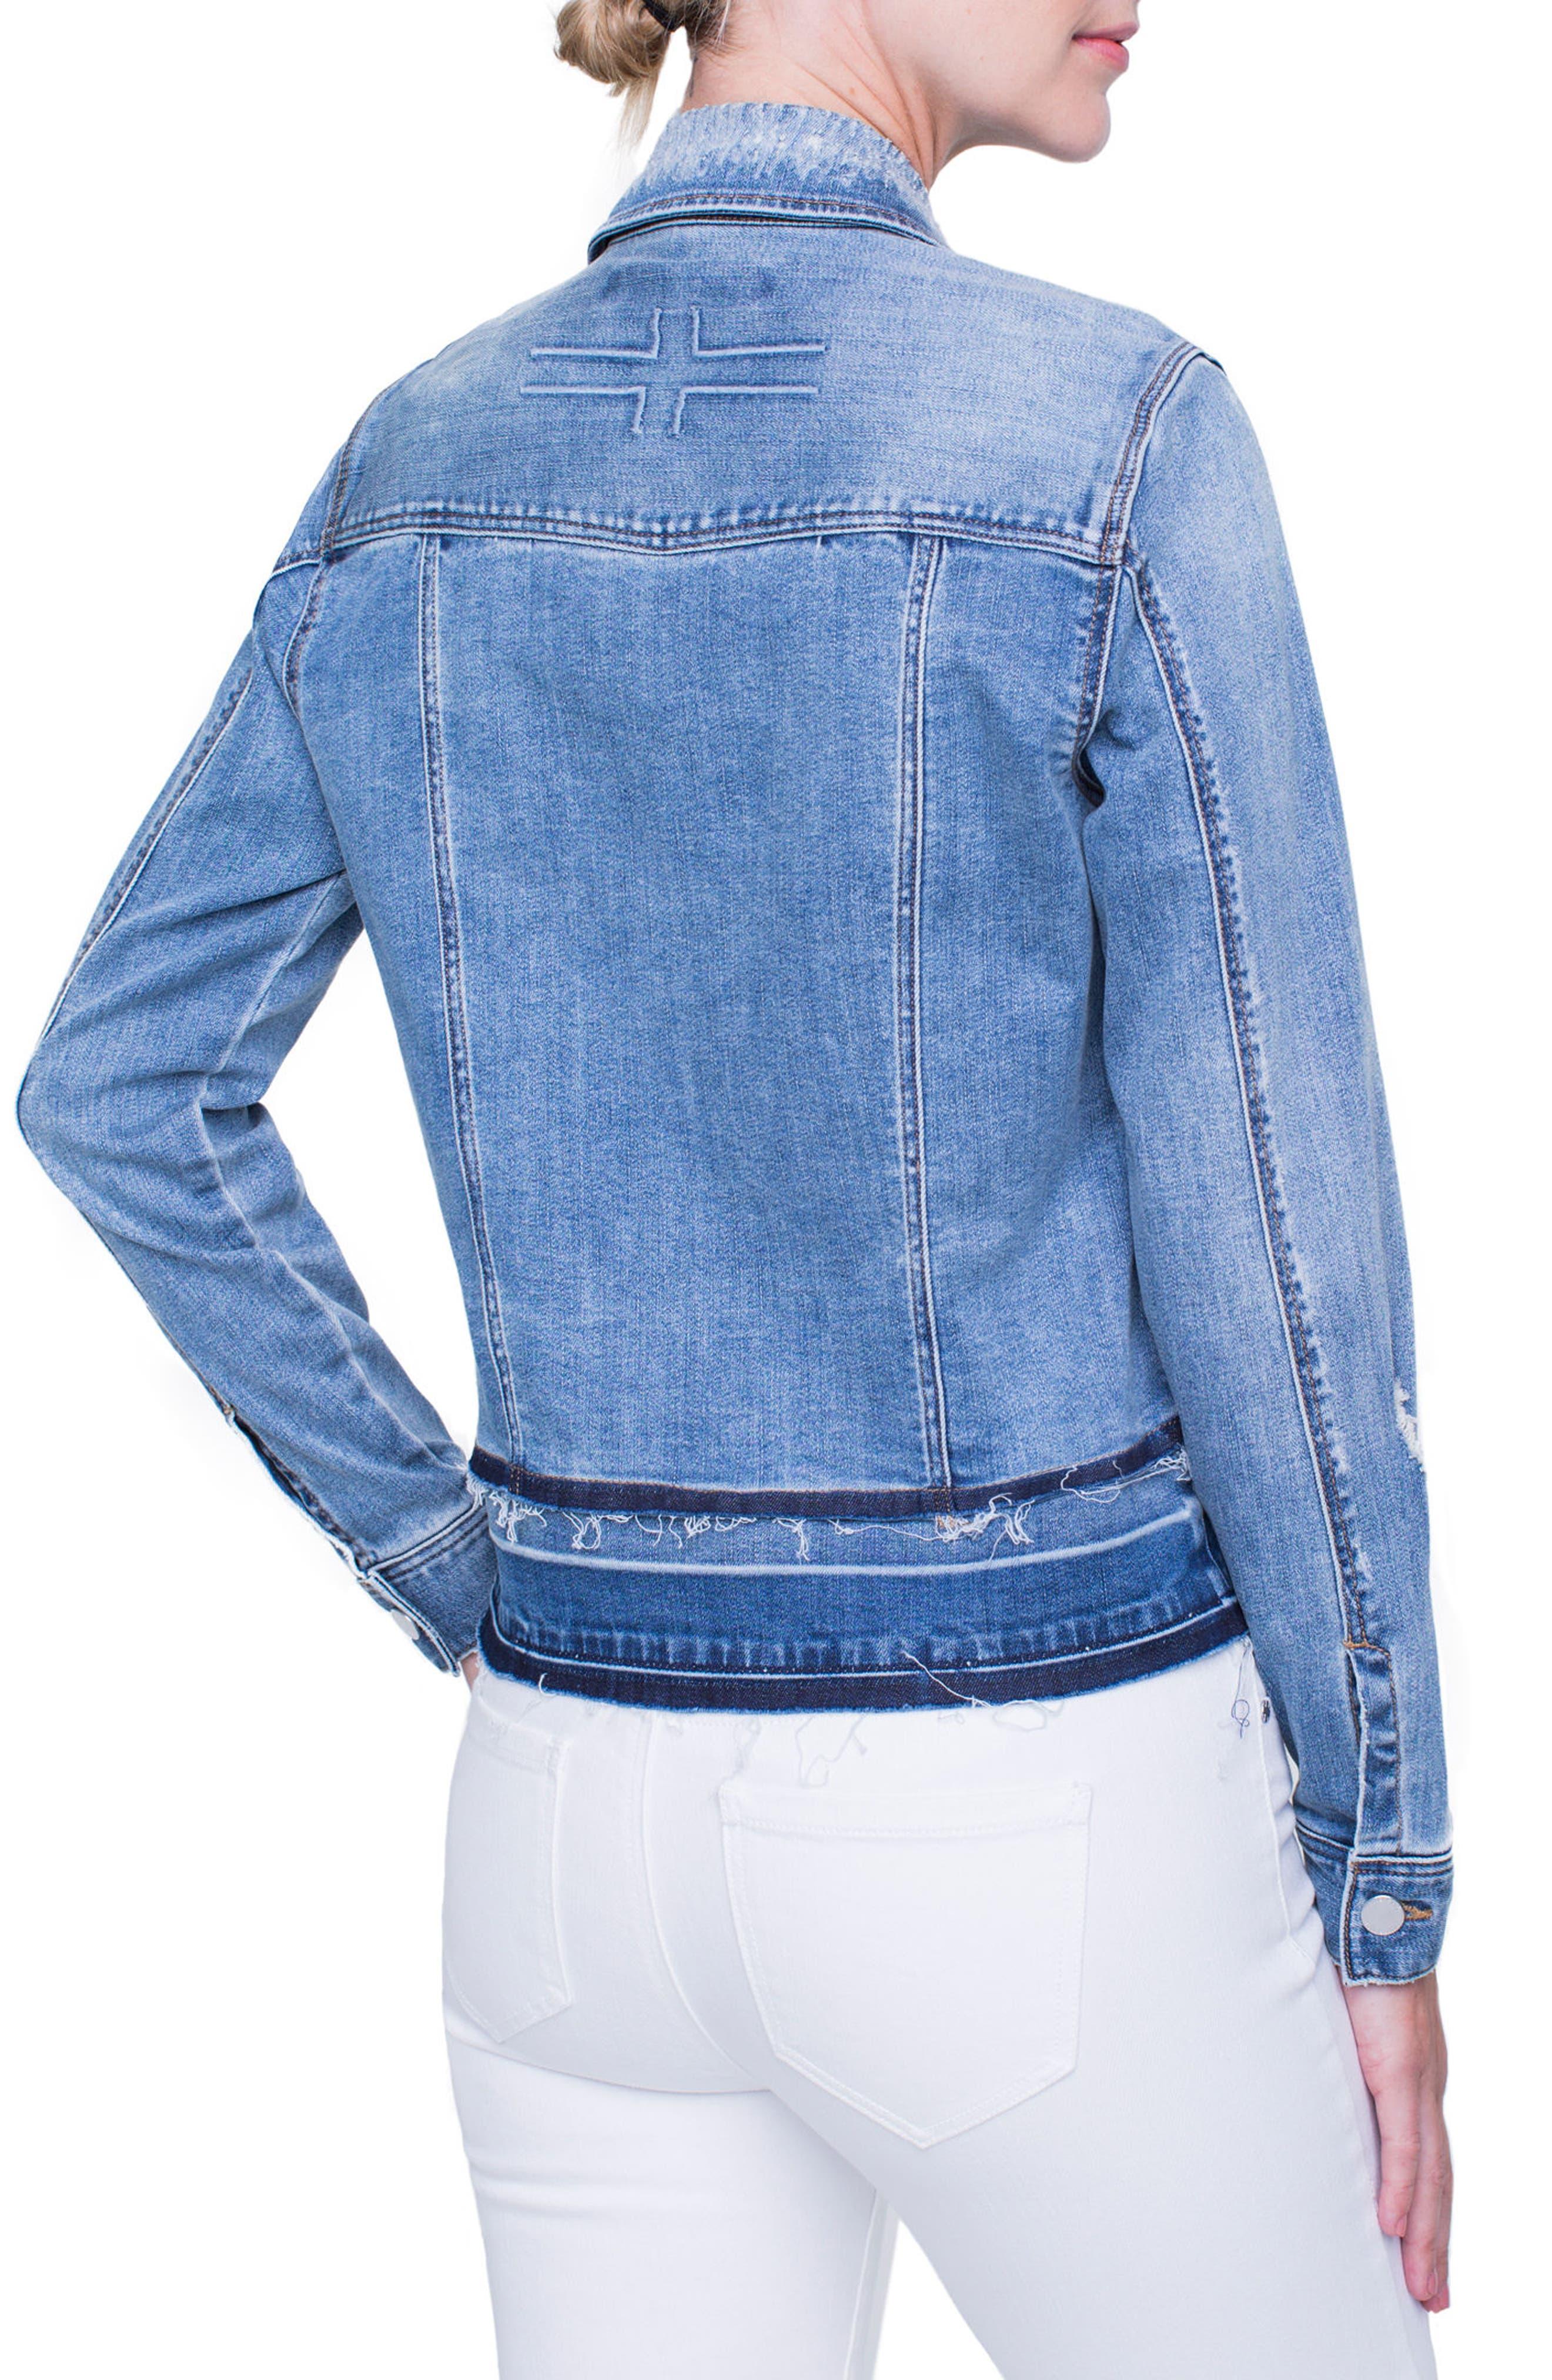 Tiered Hem Denim Jacket,                             Alternate thumbnail 4, color,                             BLUE